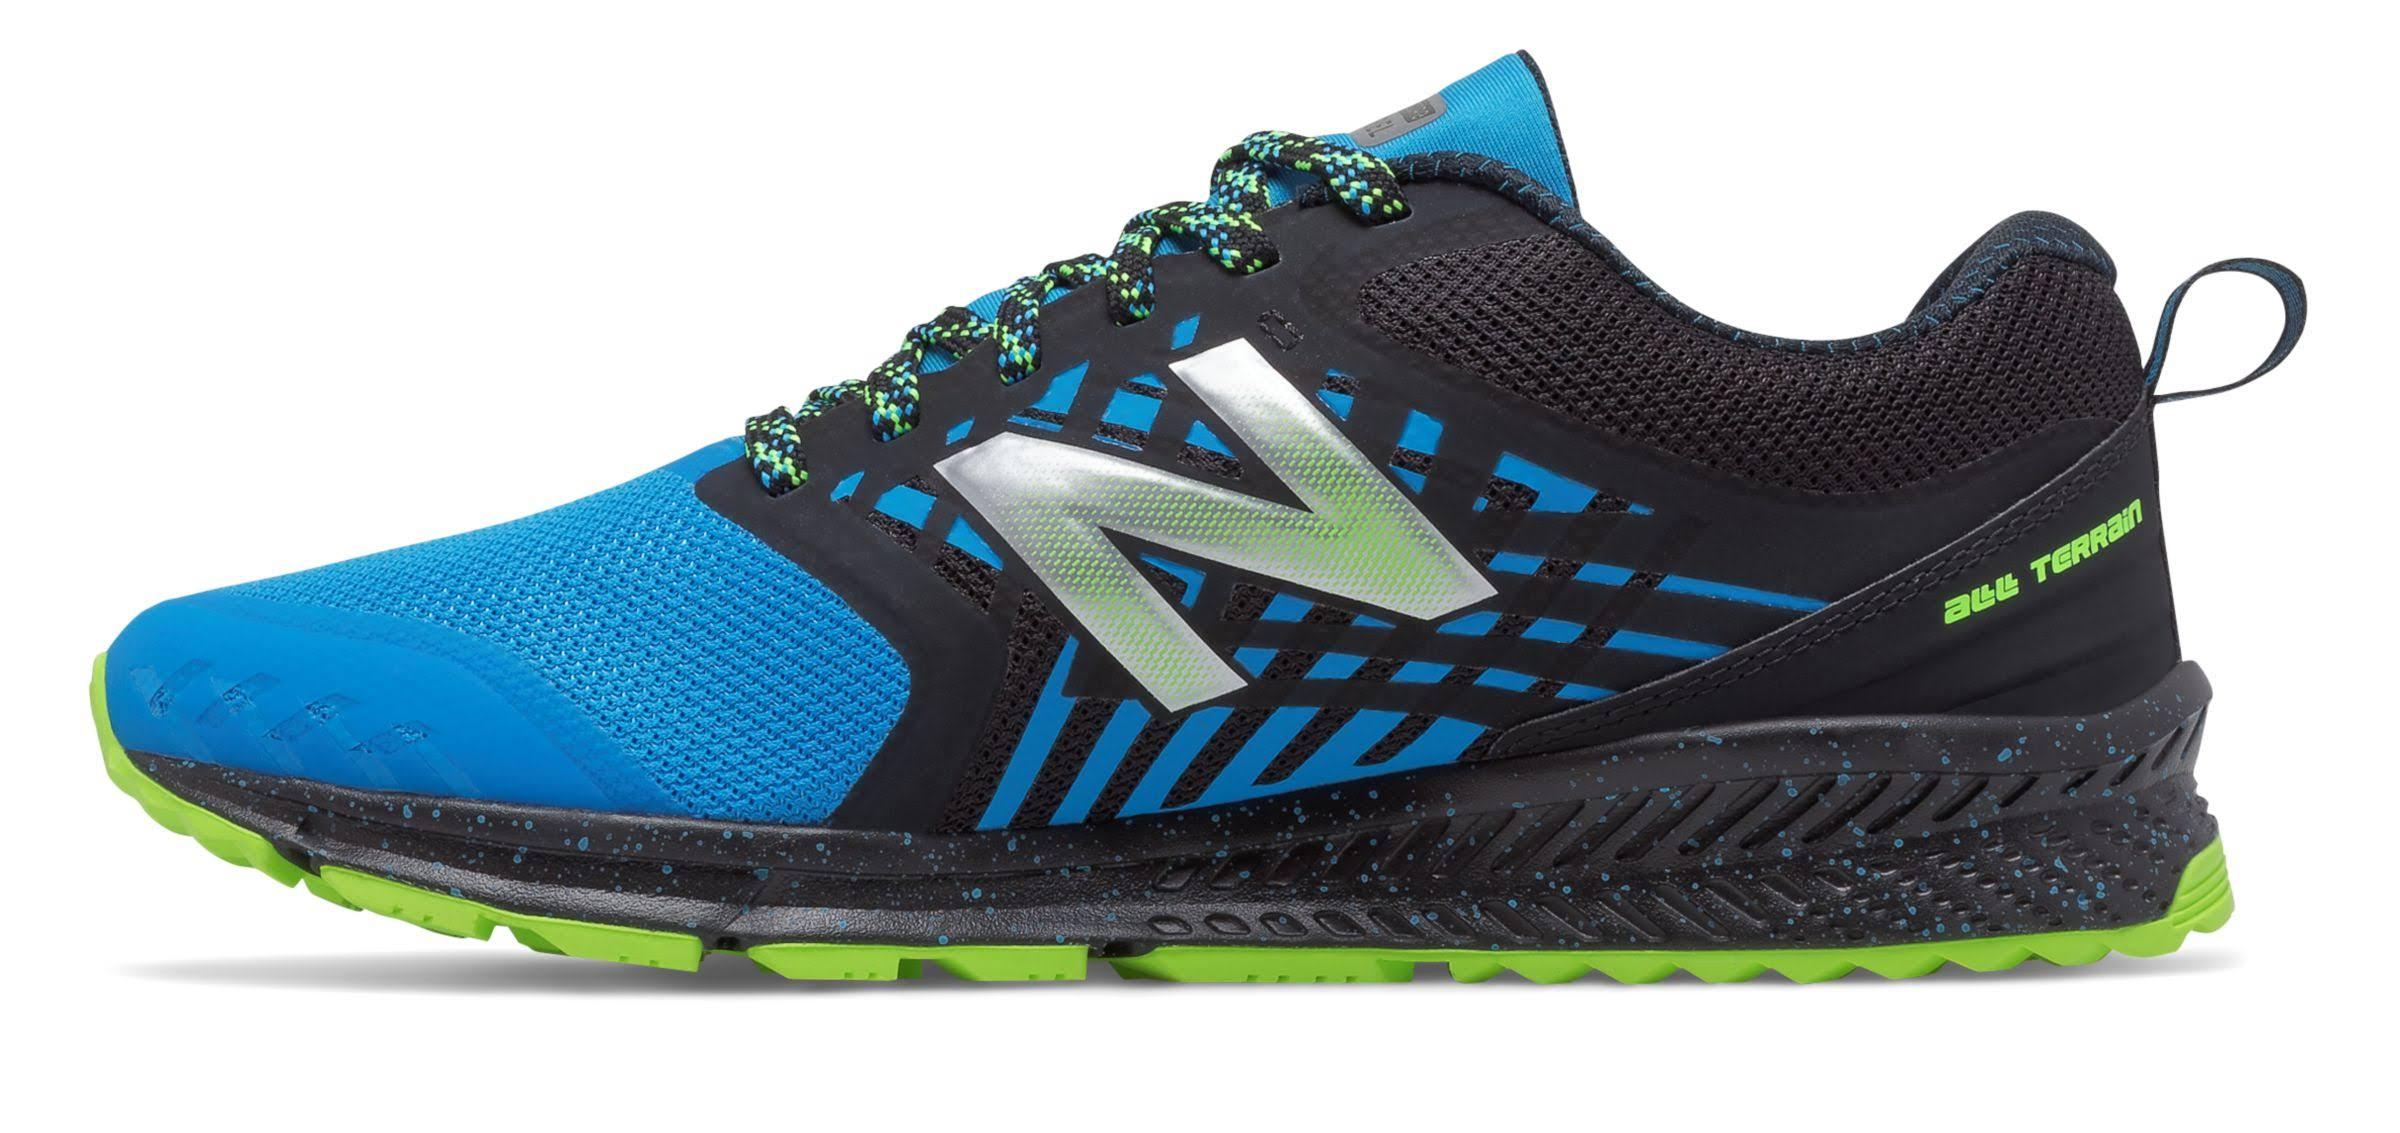 4e Azul Para Runner Perno Trail Balance 8 Mtntrlt1 5 Hombre New Negro q61PvxwHIn